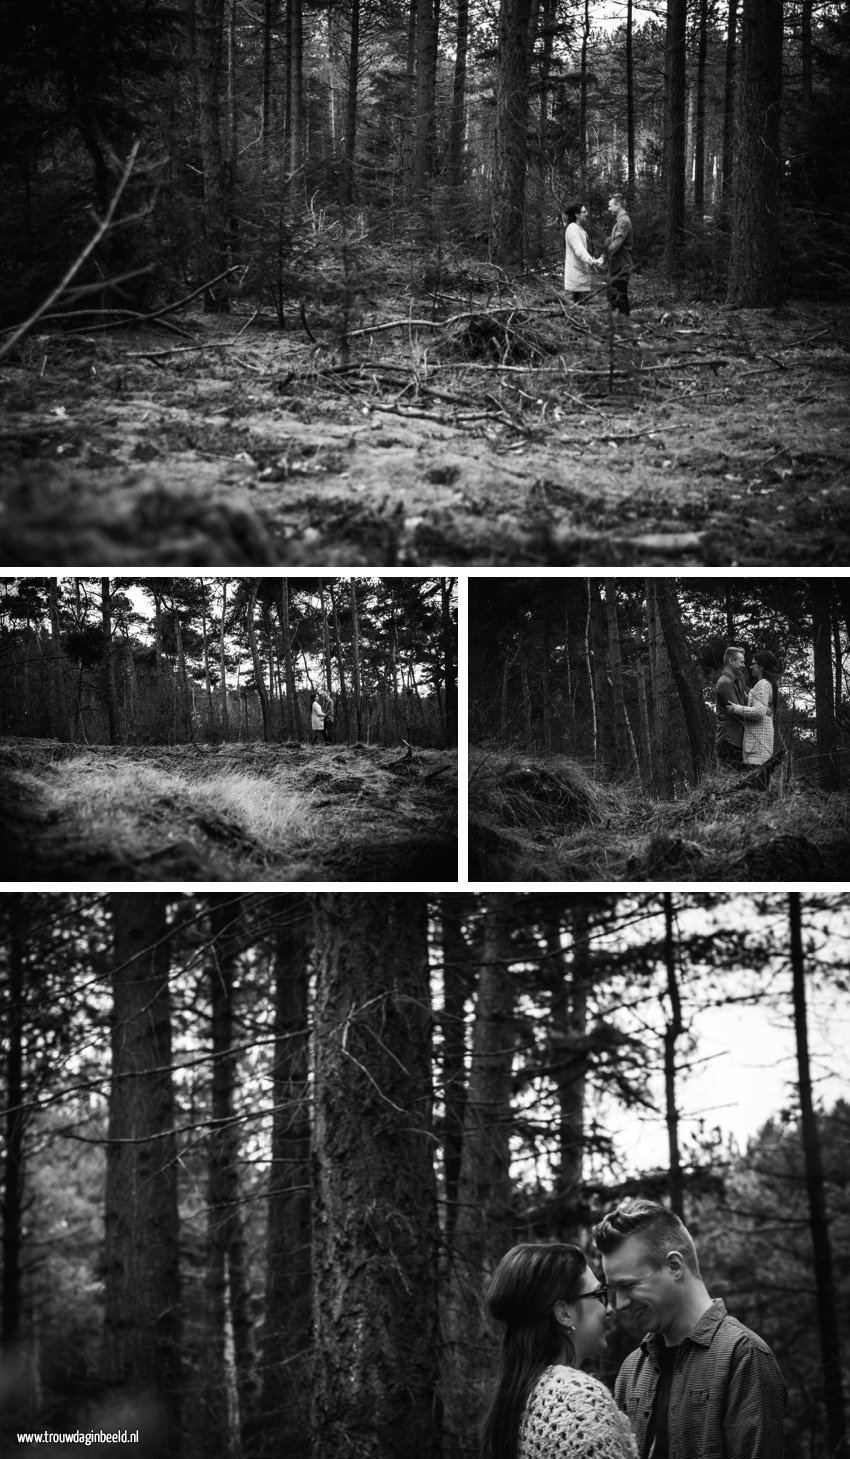 Loveshoot natuurgebied Geldrop